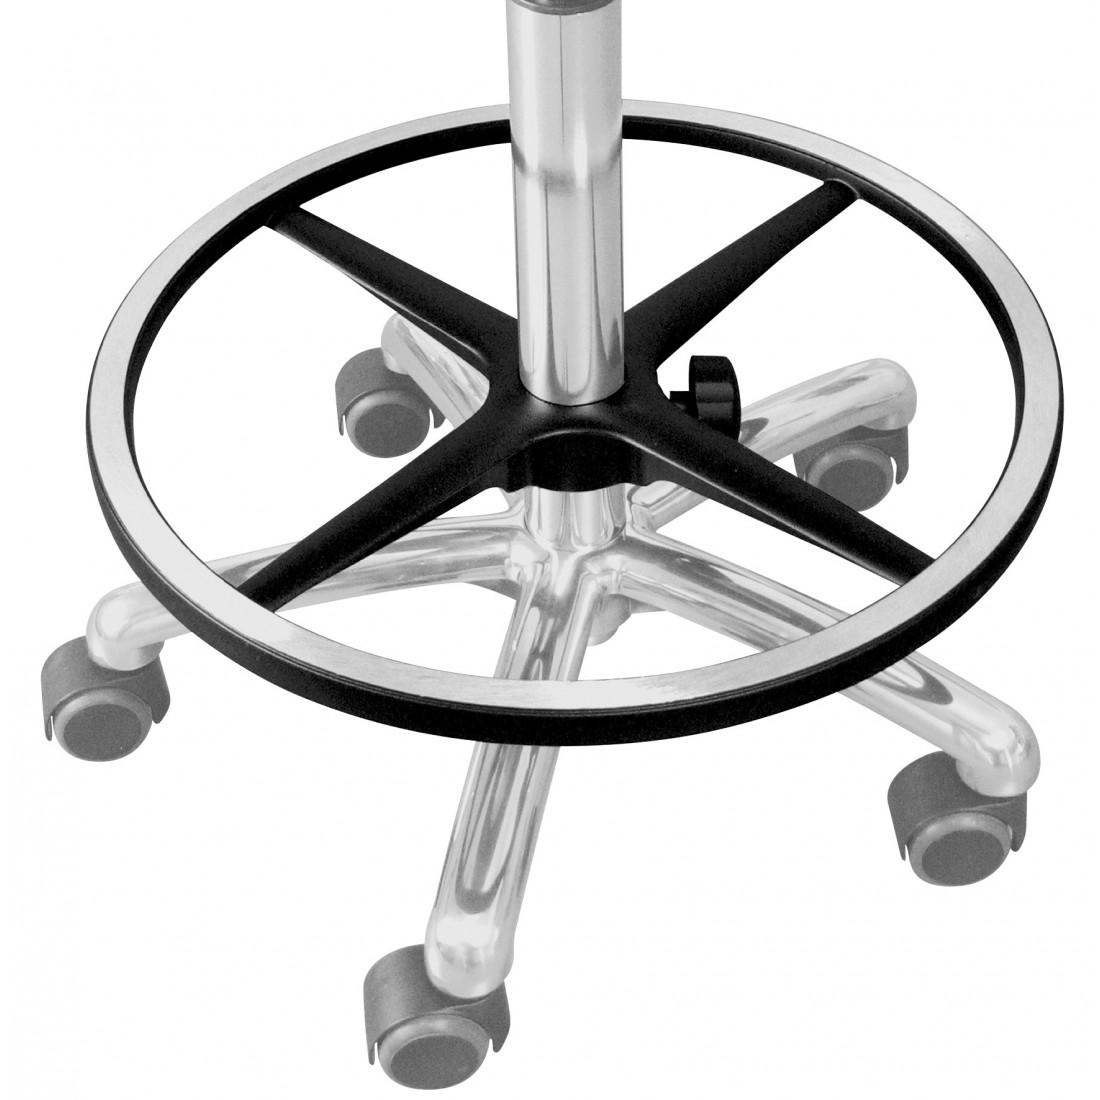 Circular footrest